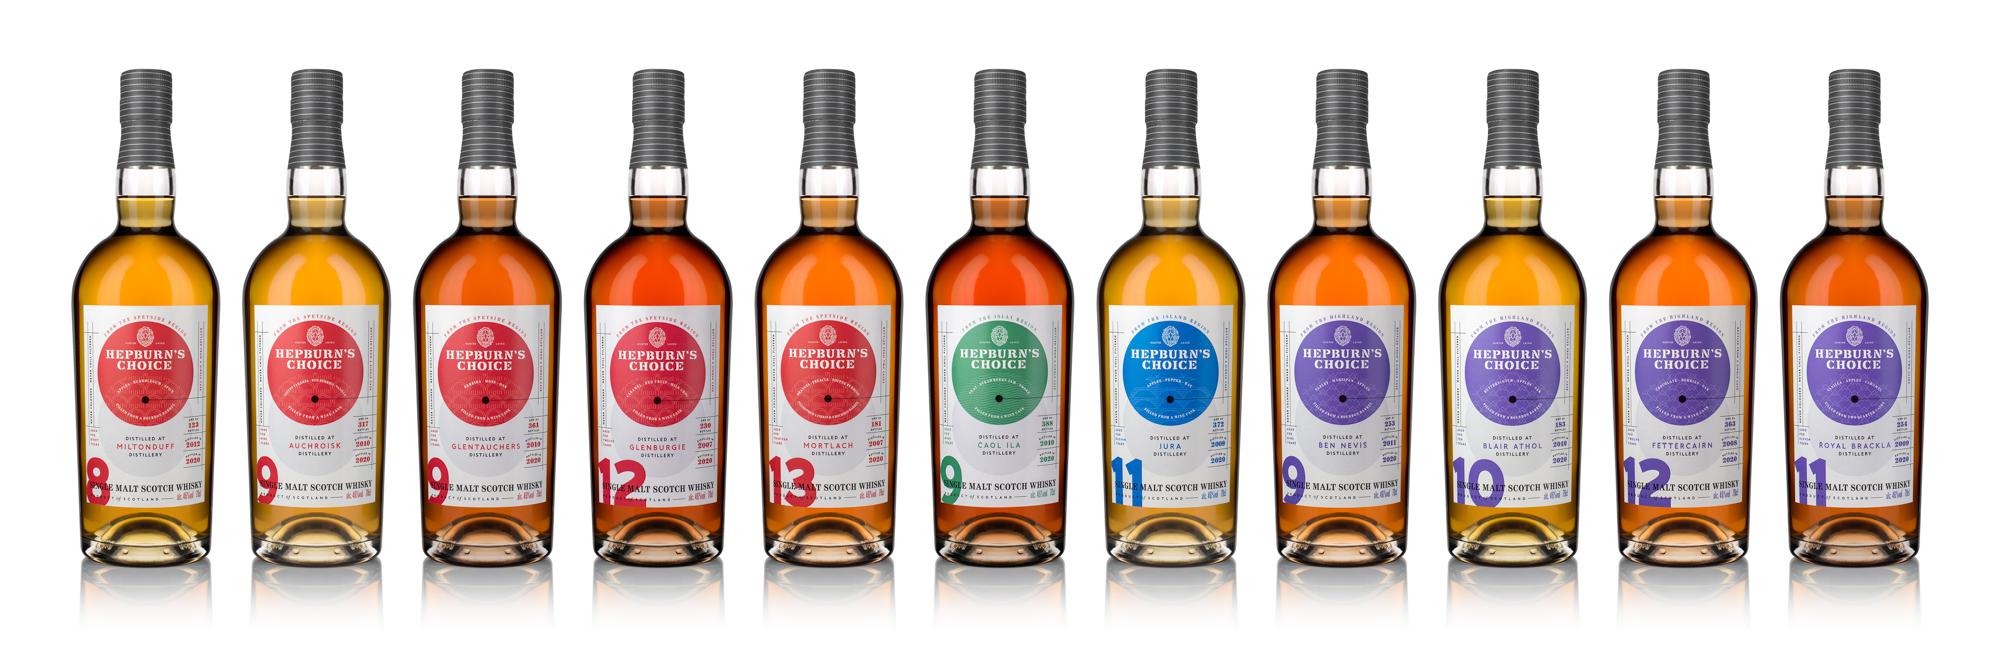 Bottles of Hepburns range- Food and Drink News Scotland